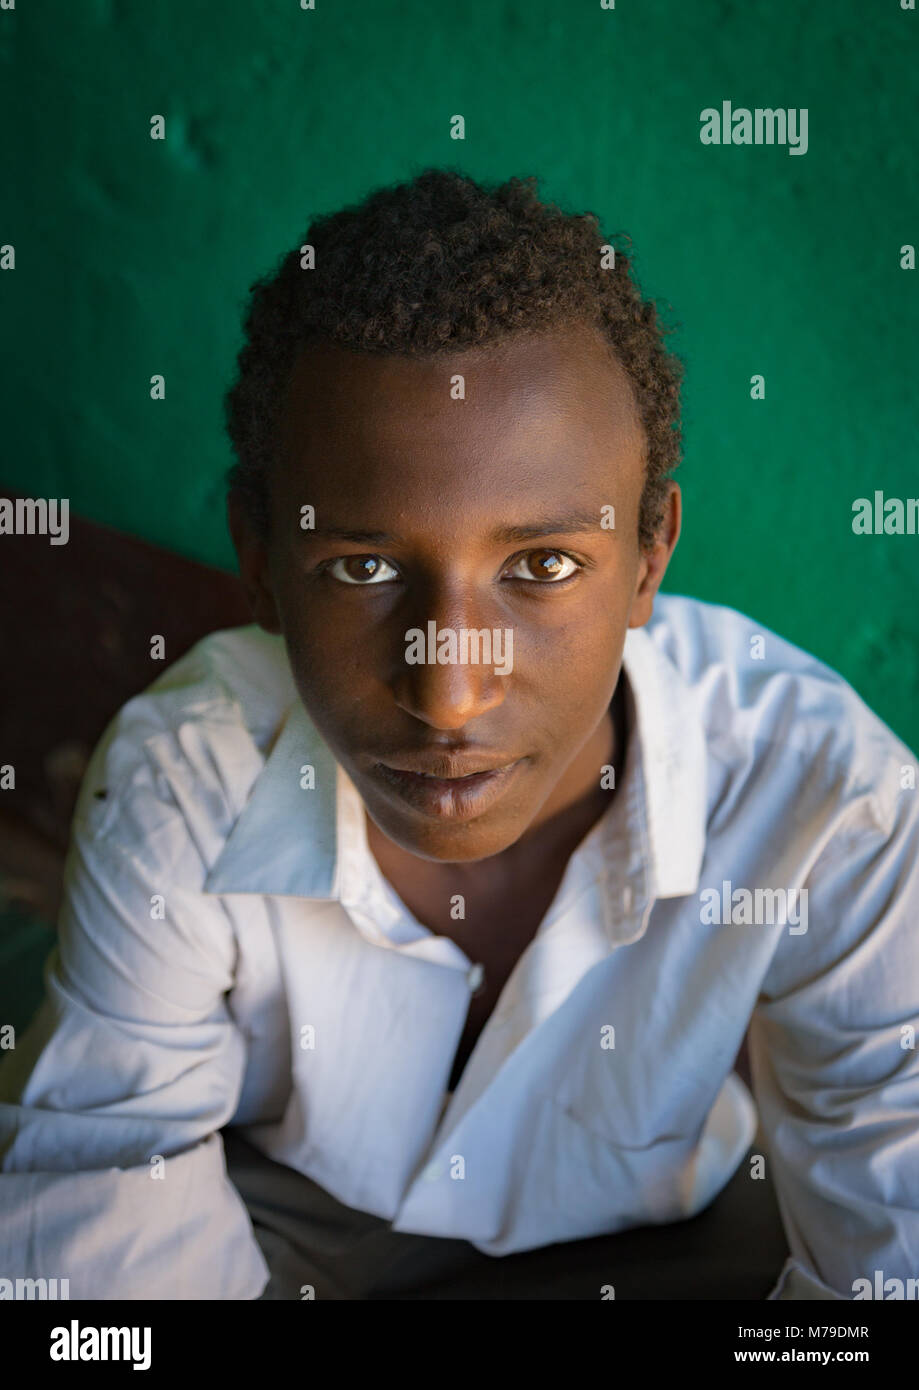 Sufi young man, Harari region, Harar, Ethiopia - Stock Image